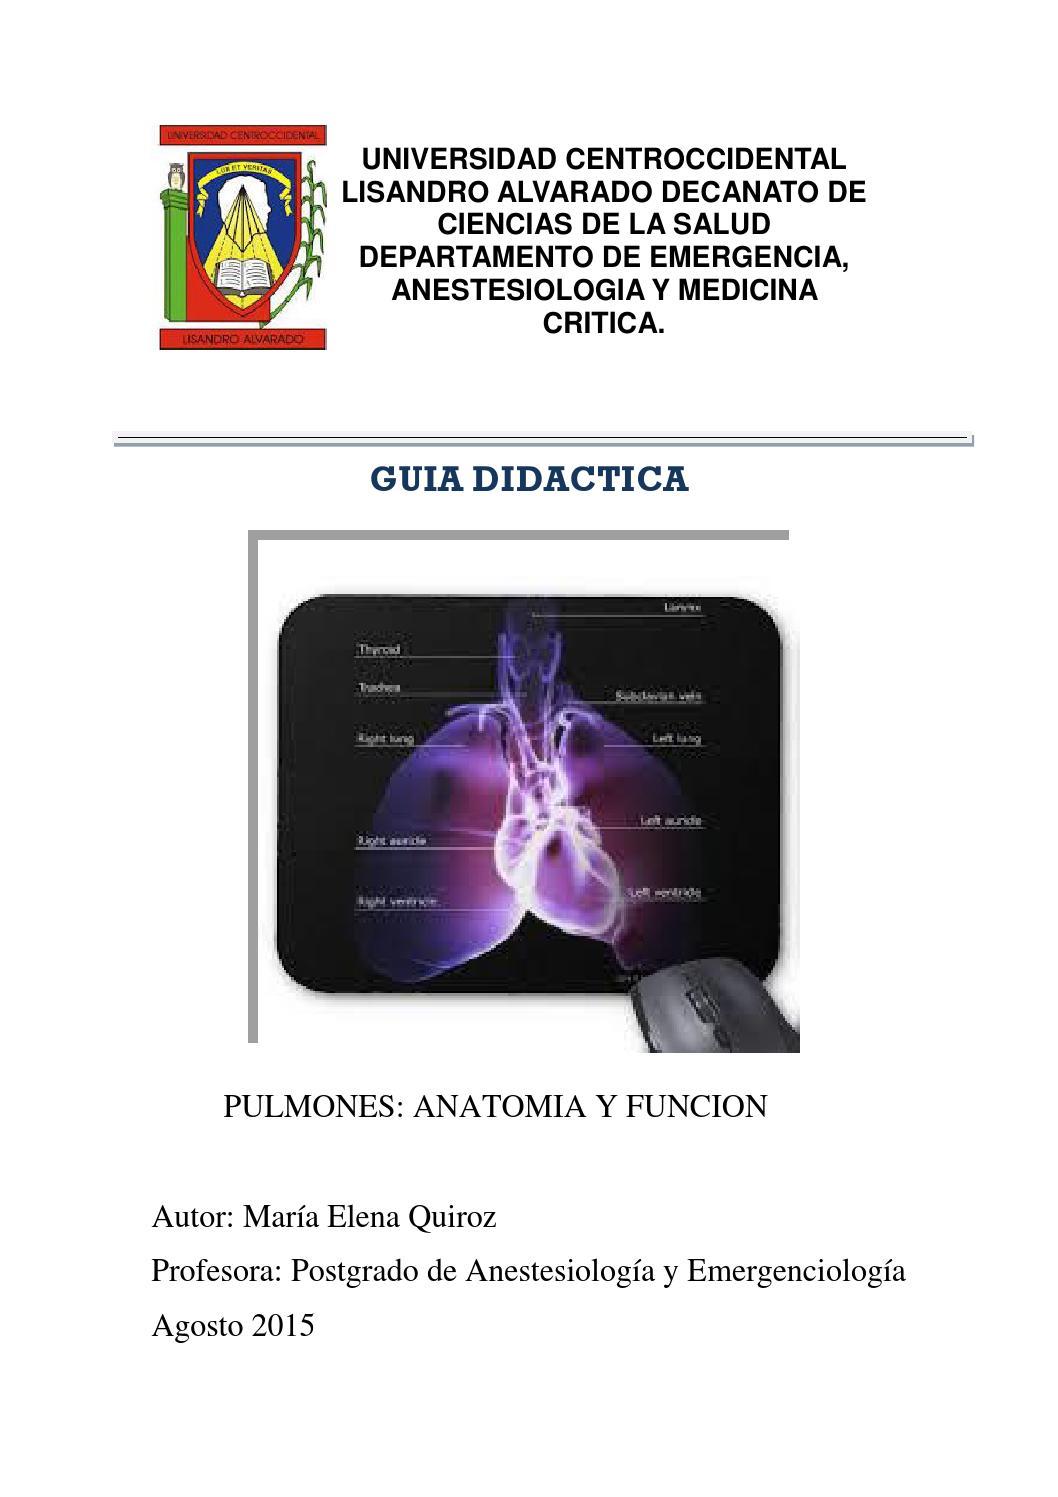 Fisiologia respiratoria para diplomado by mariaquiroz3 - issuu